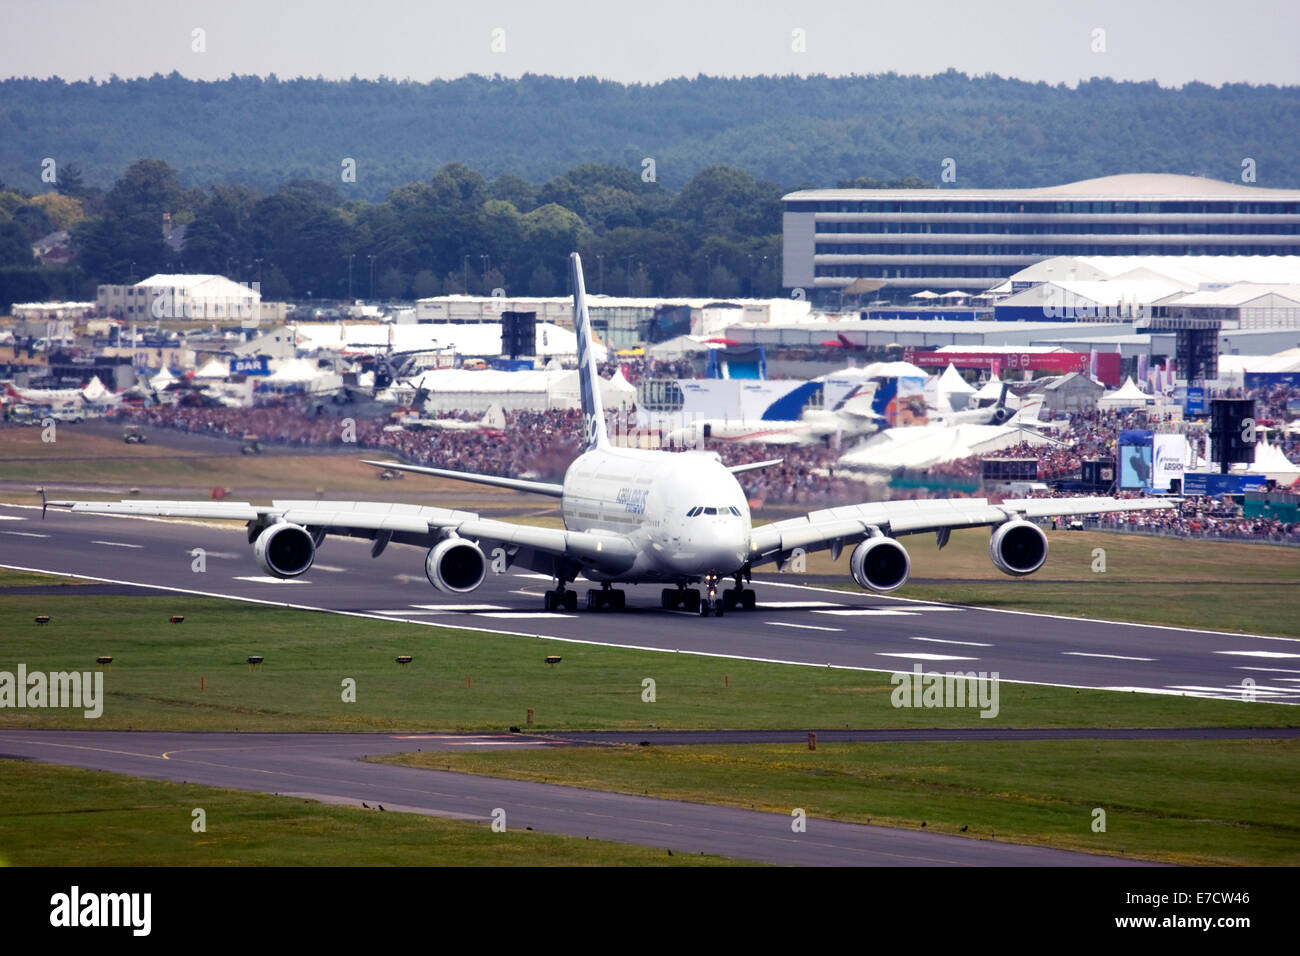 Airbus A380-841 at Farnborough International Airshow 2014 Stock Photo